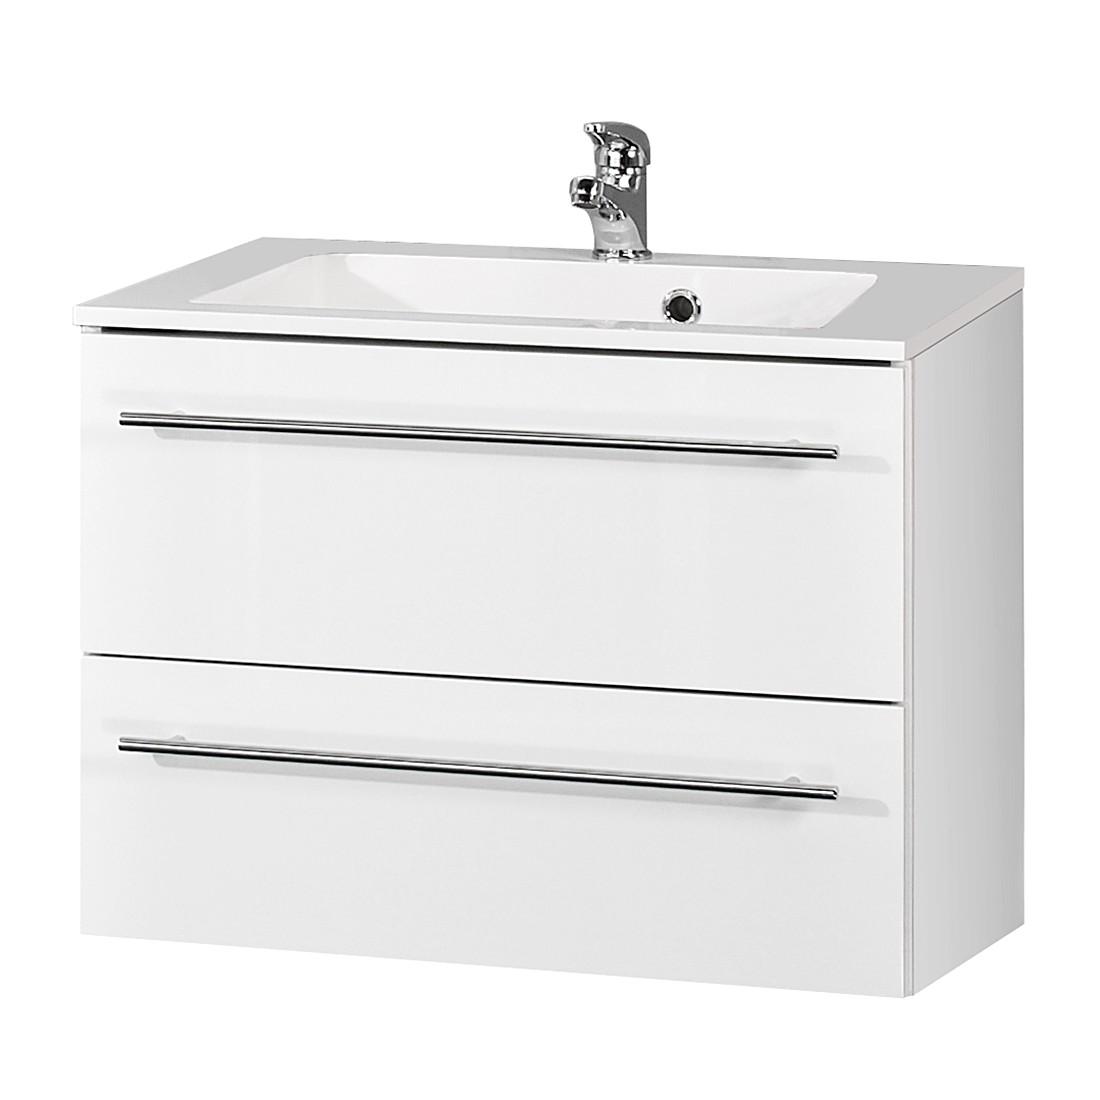 Home 24 - Meuble lavabo bern i - blanc, schildmeyer